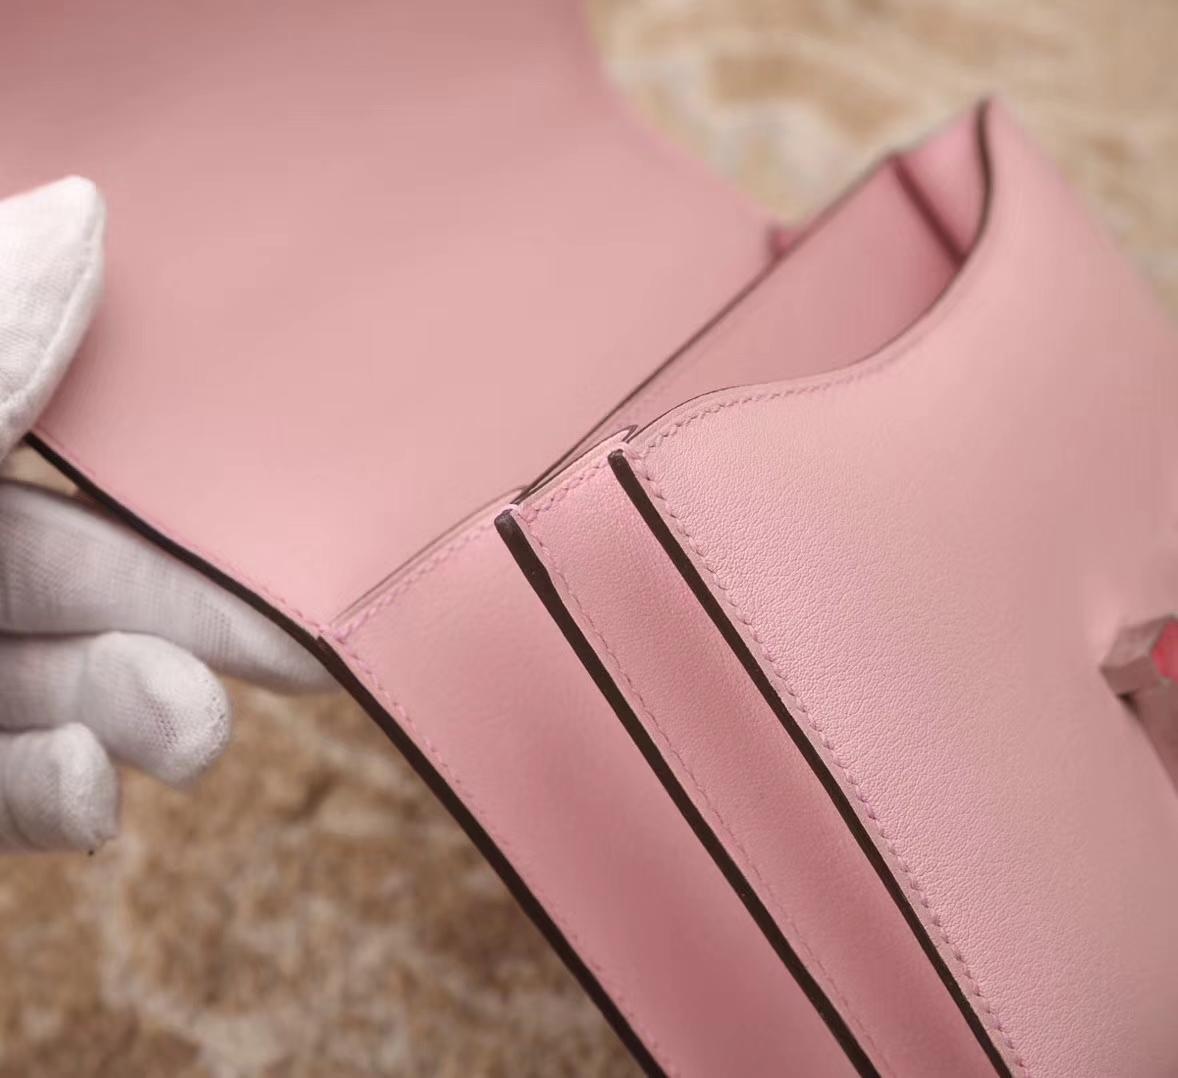 Hermes爱马仕 Constance 19 3Q 新樱花粉 原厂御用顶级Swift皮 银边红色蜥蜴扣